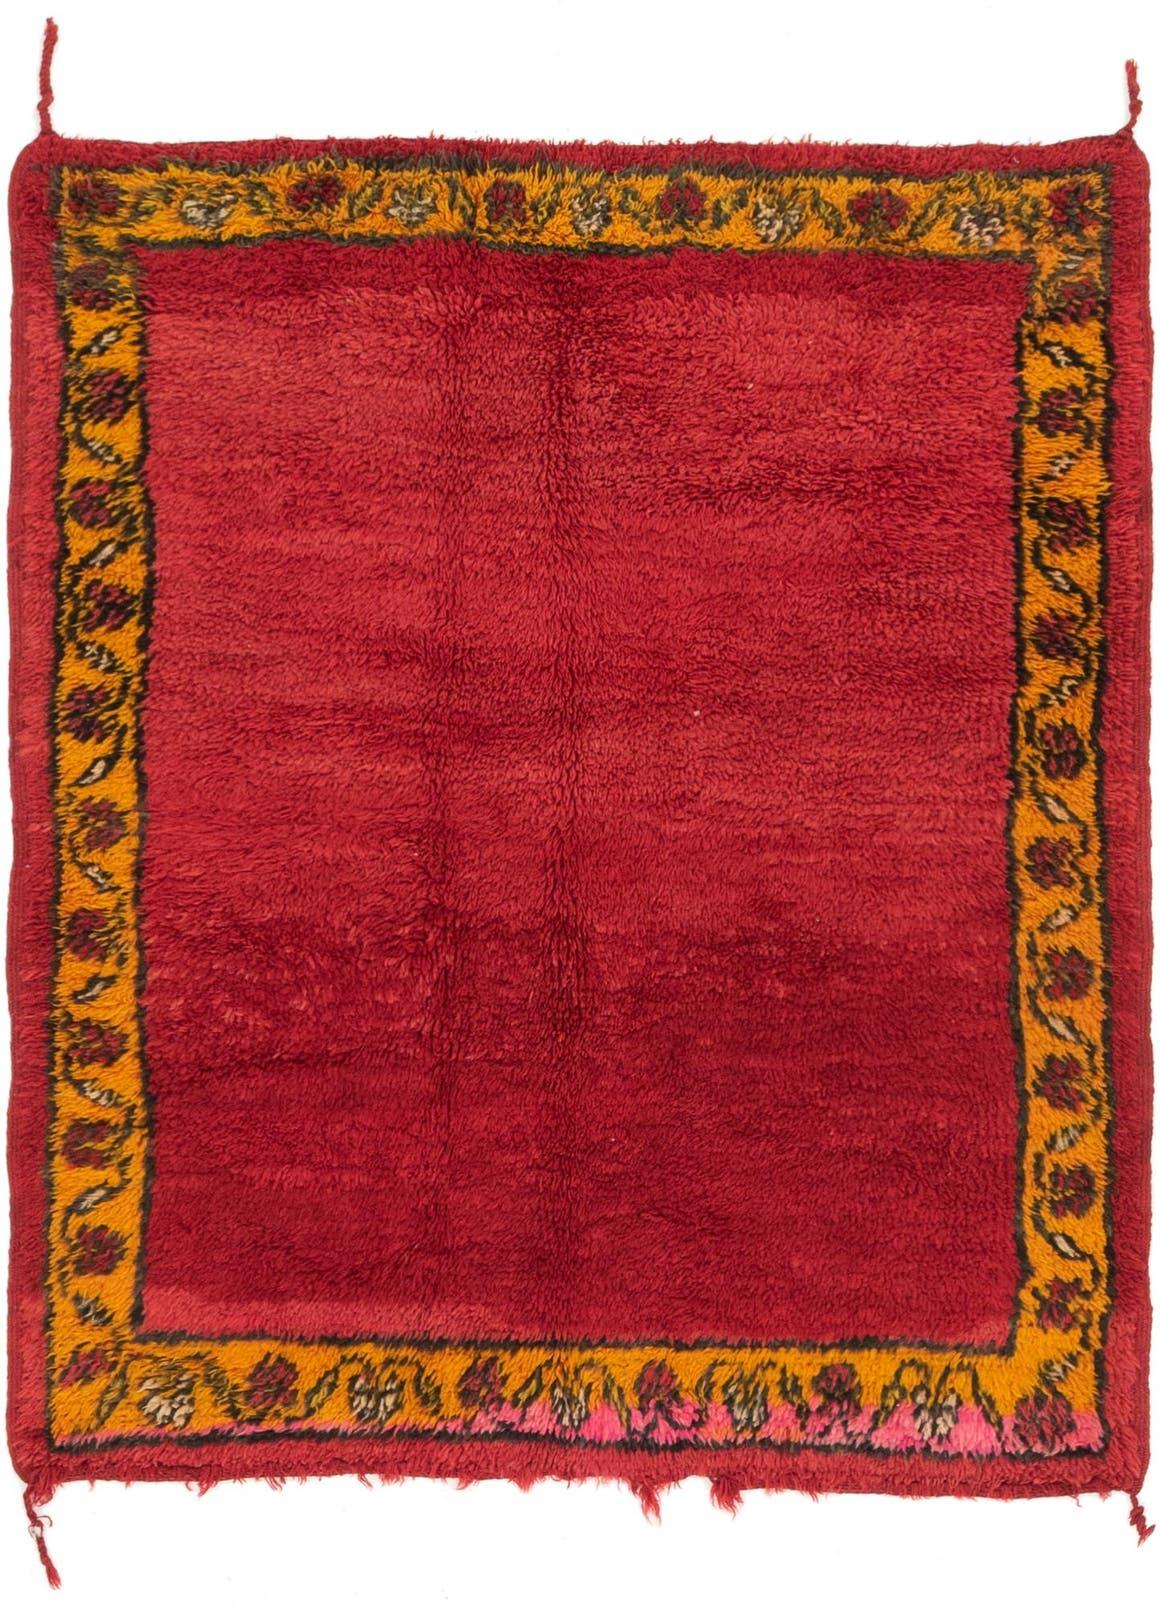 4' x 5' 4 Moroccan Rug main image